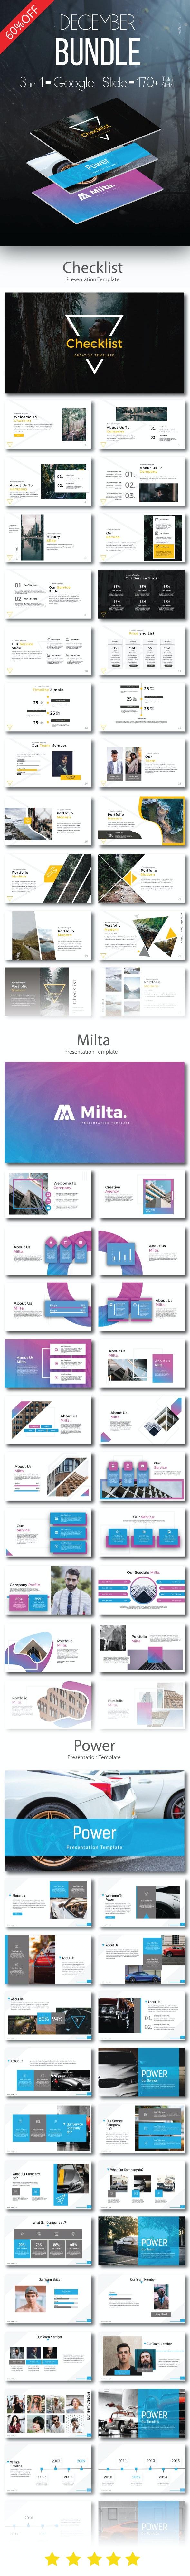 December Bundle 3 in 1 Google Slide - Business PowerPoint Templates